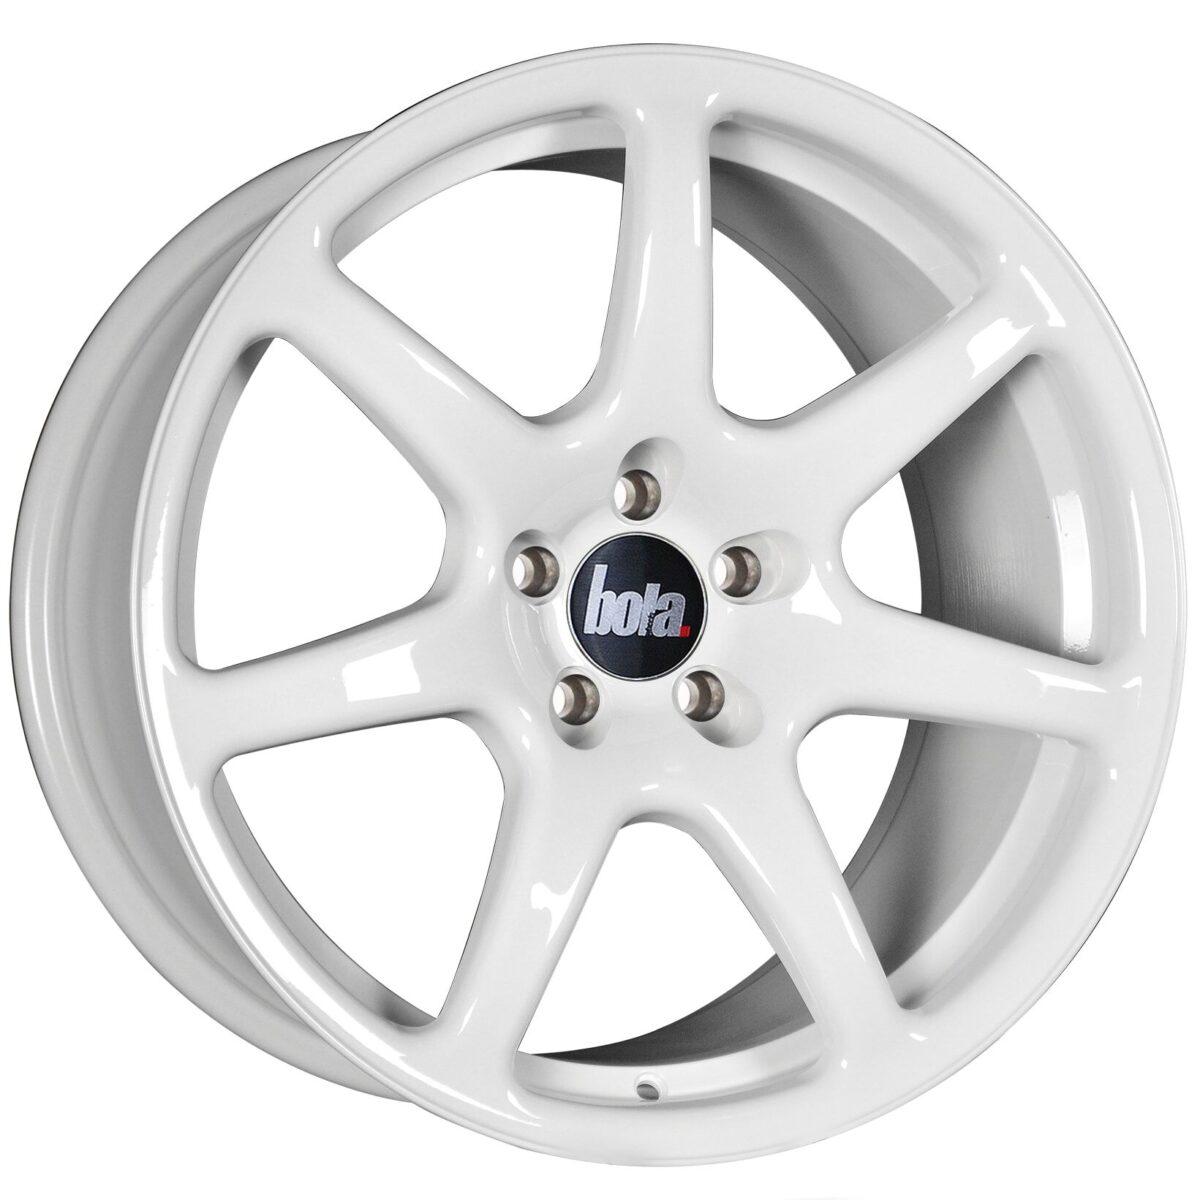 "18"" BOLA B7 Wheels - White - All BMW Models"